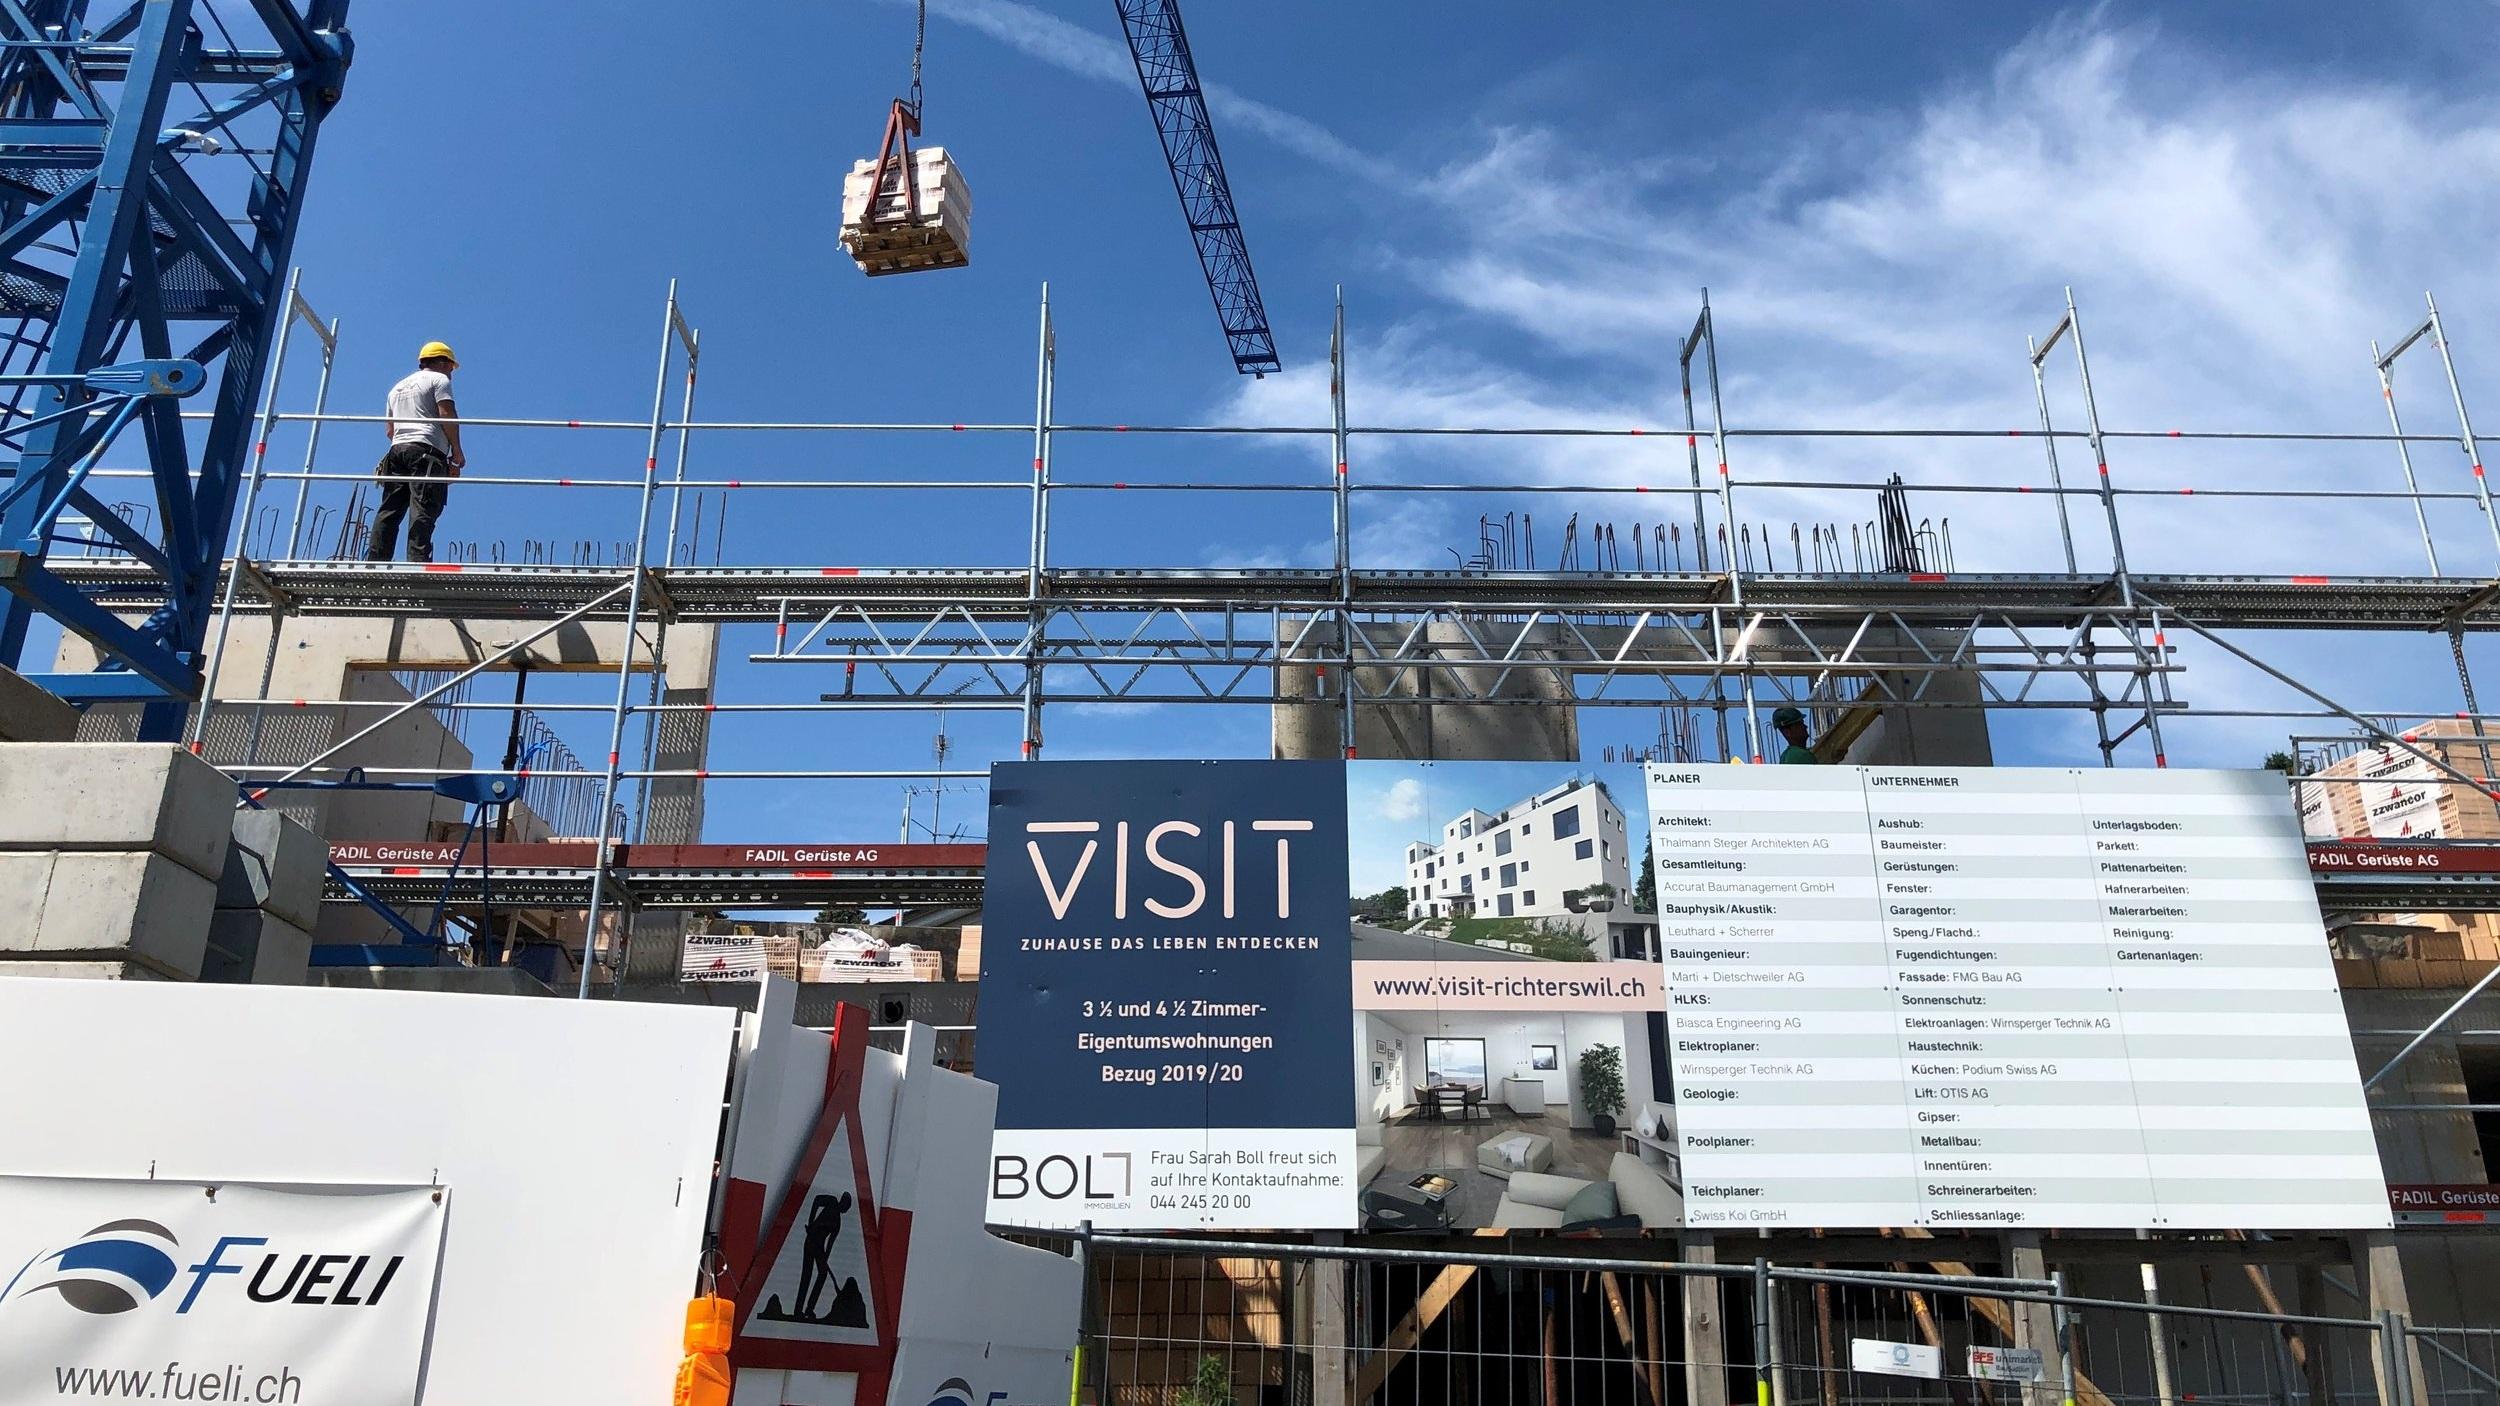 VISIT+-+Baustelle+Neubauprojekt+Boll+Immobilien+Immobilie+verkauft+Richterswil